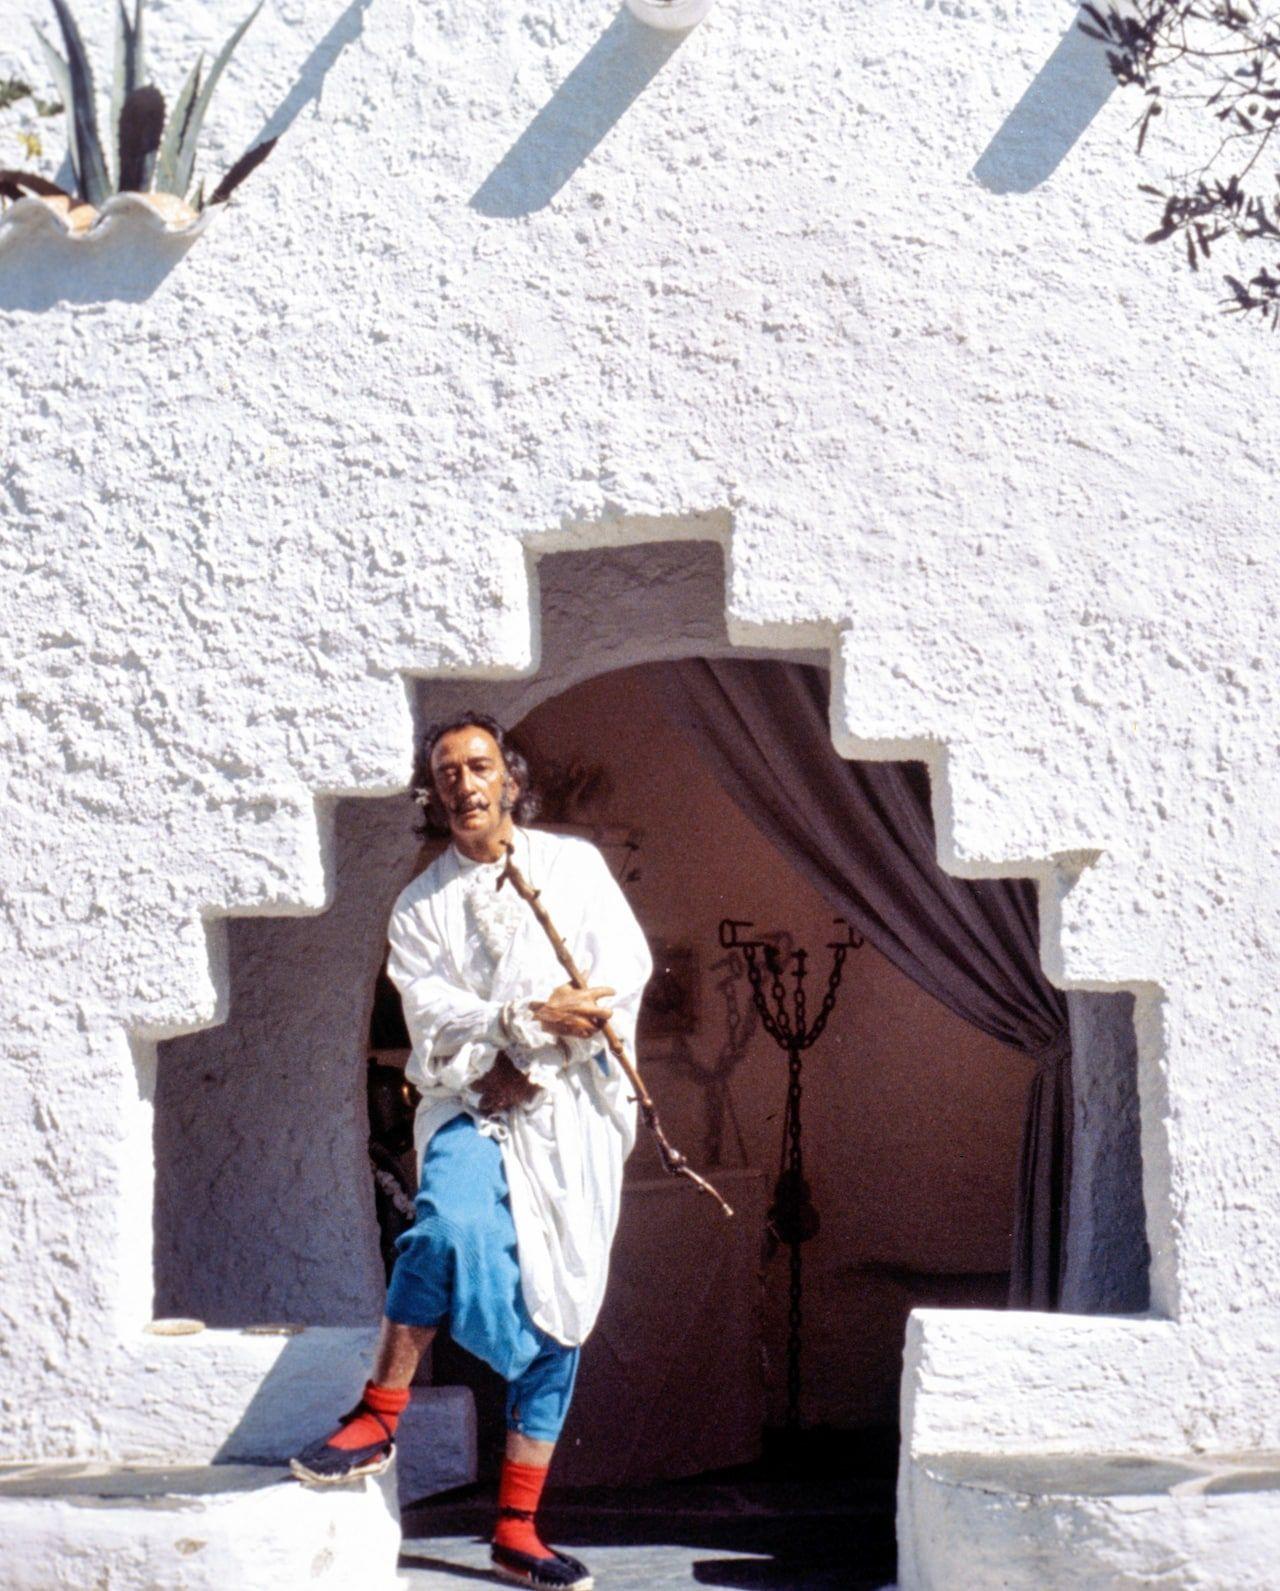 Memo from Salvador Dalí Re: Espadrilles